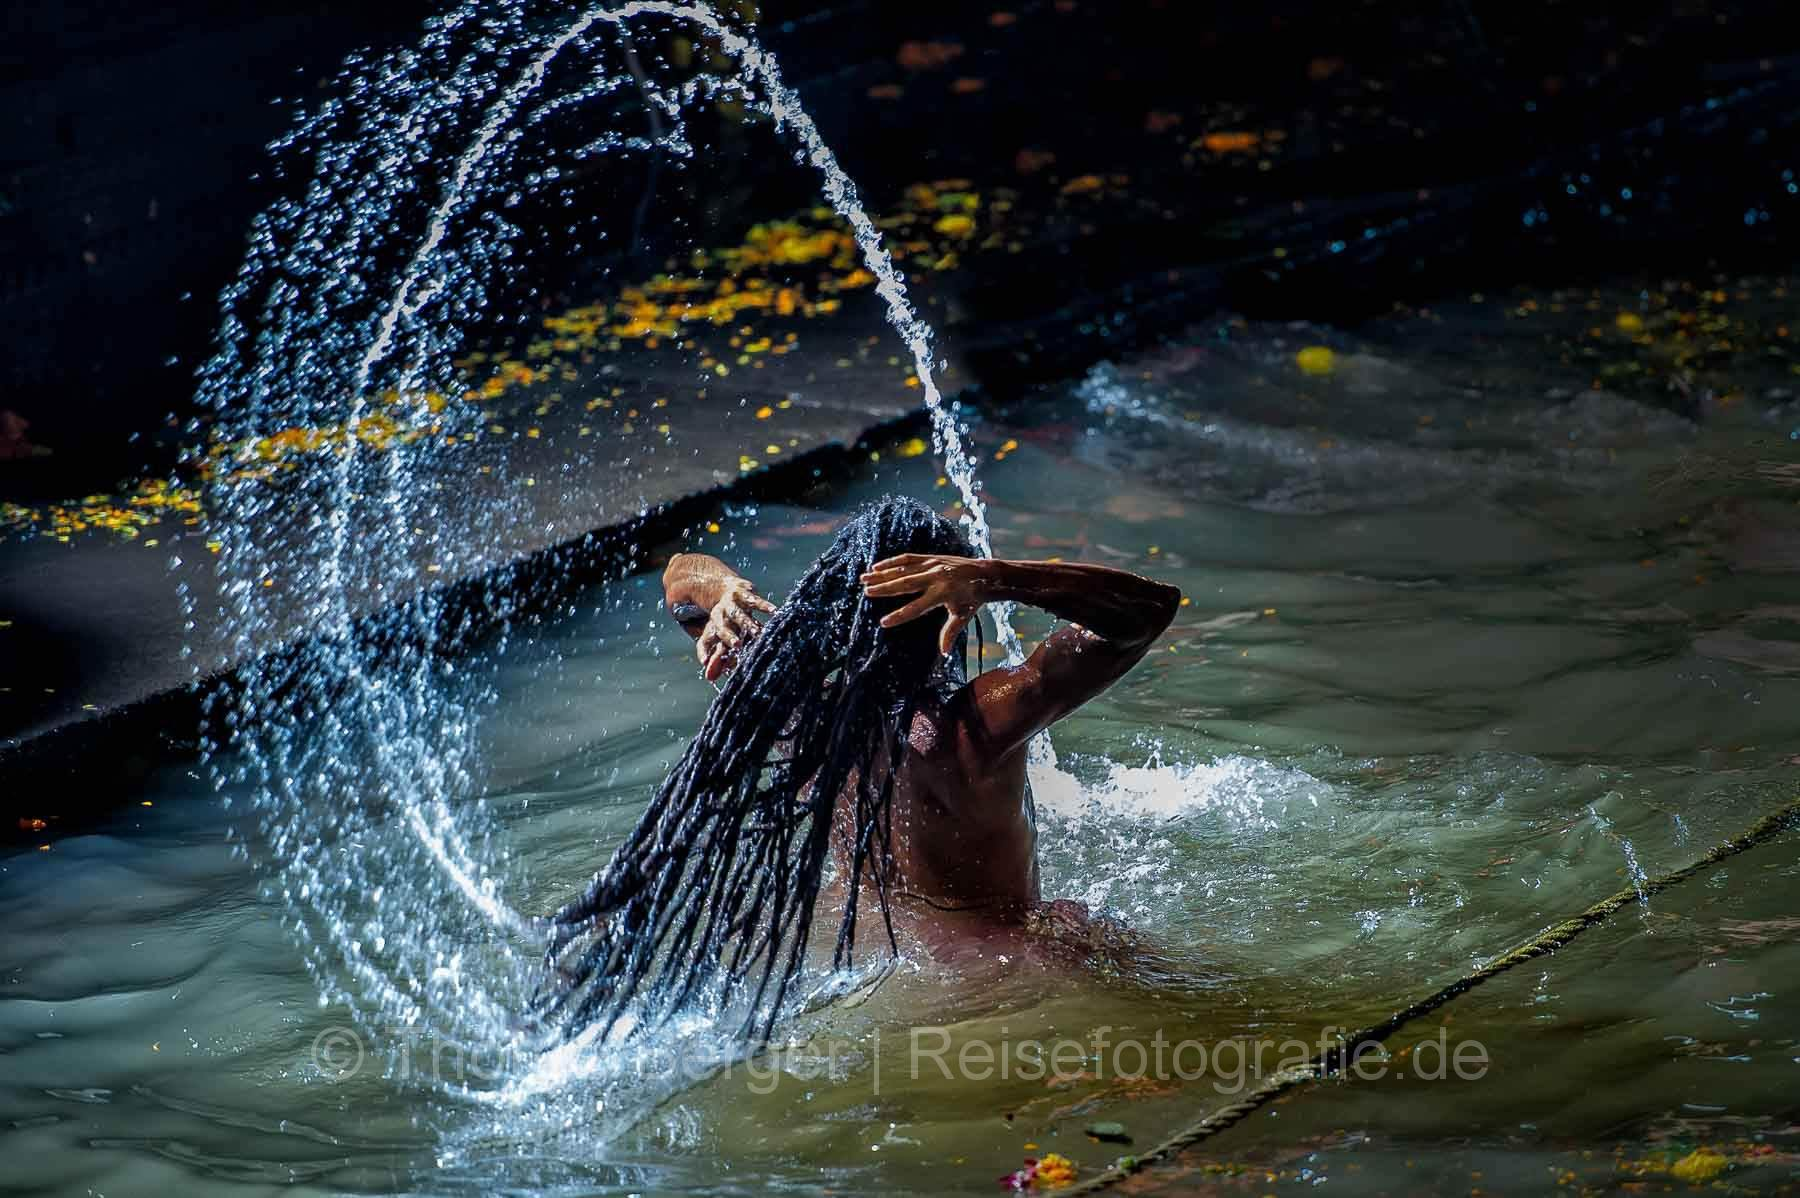 Das heilige Bad - Kumbh Mela in Trimbak 2016